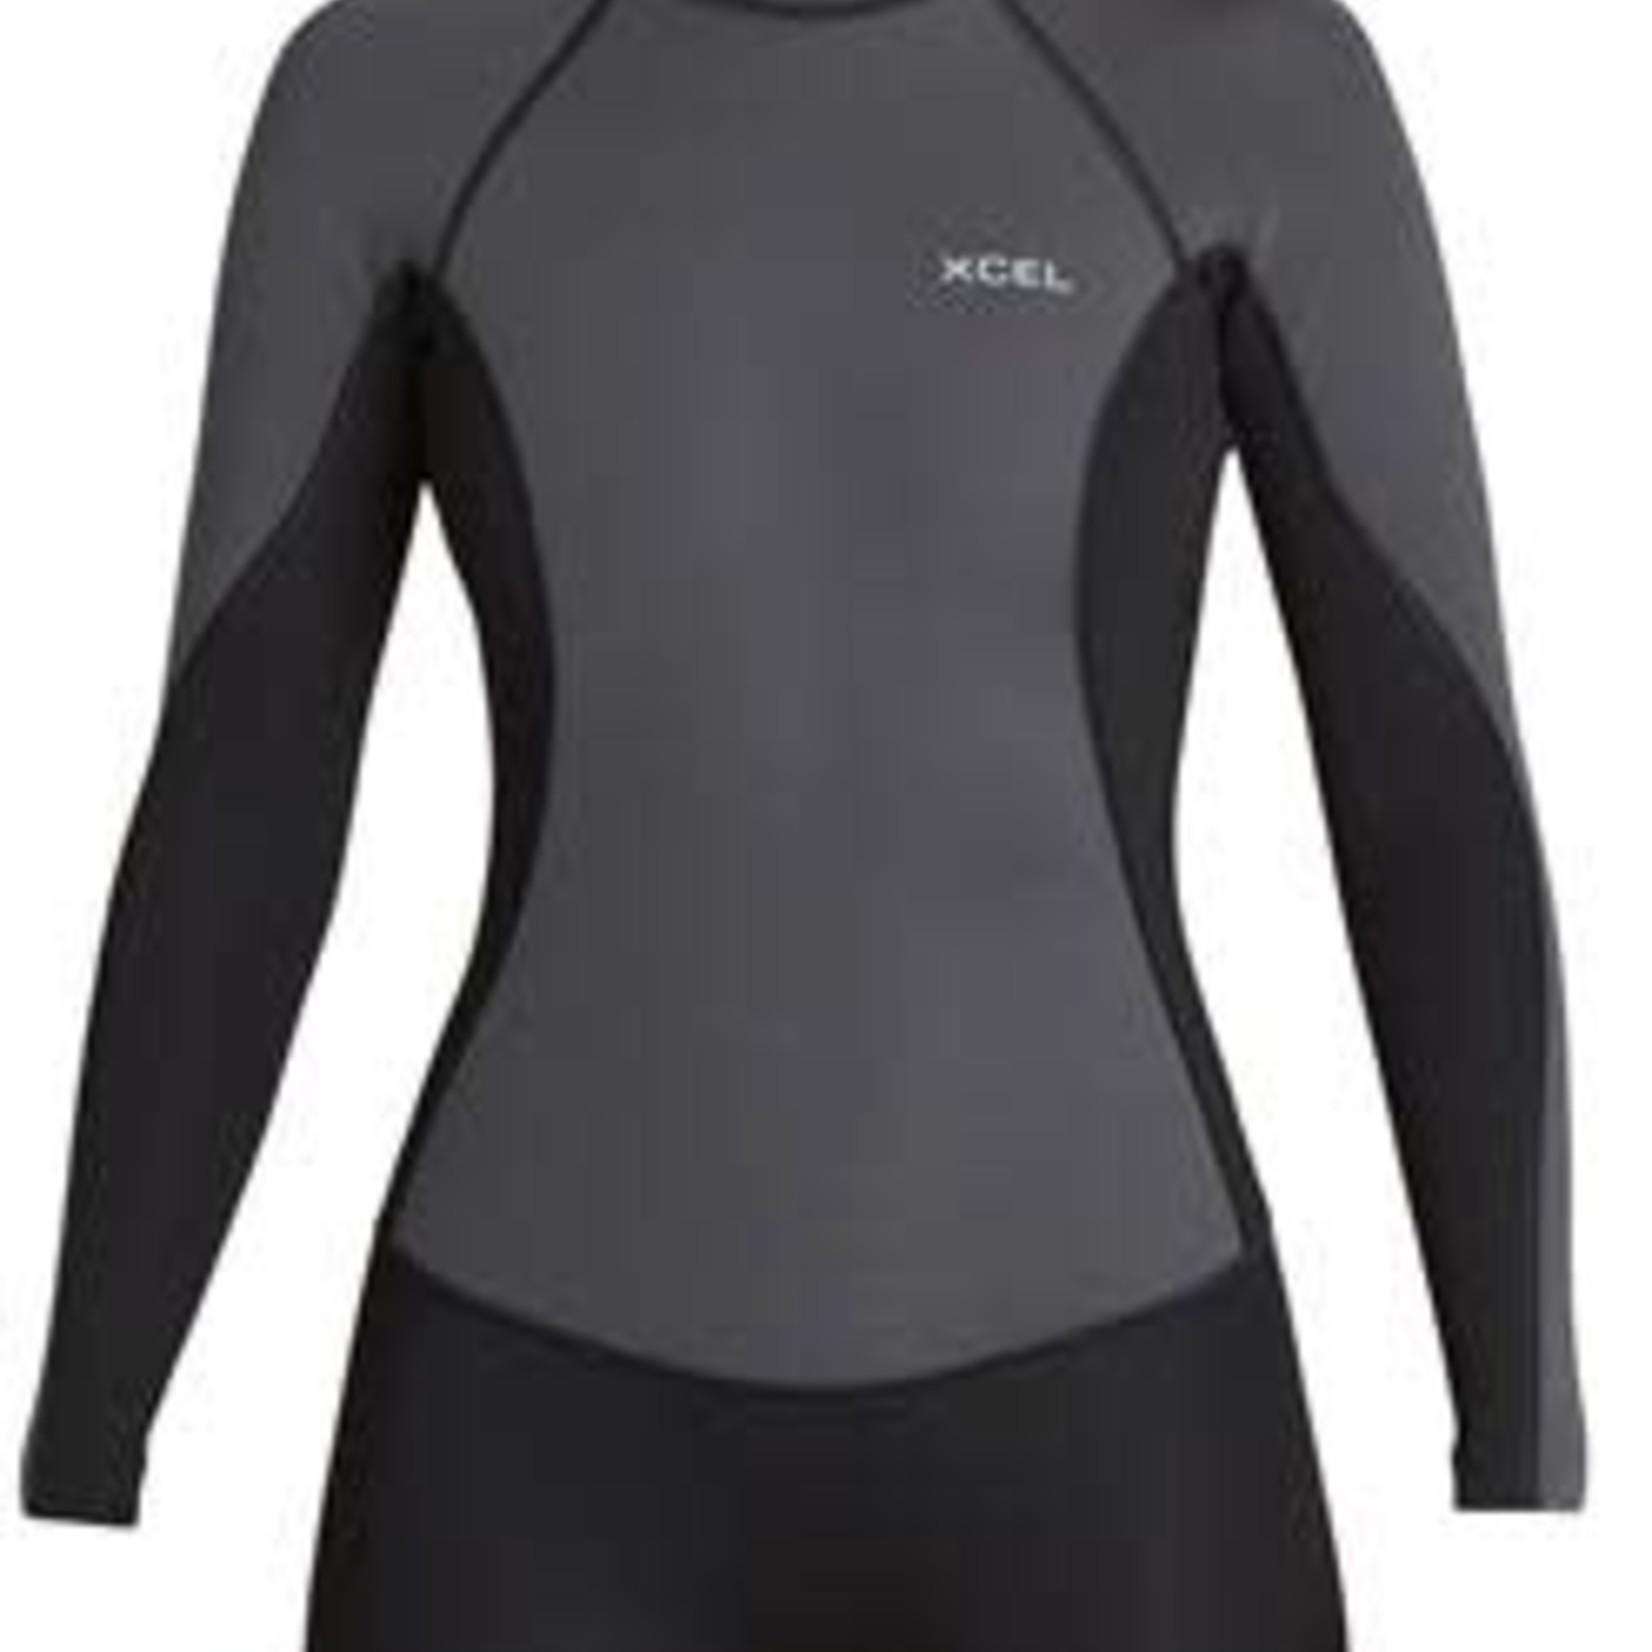 XCEL Wetsuits XCEL Axis 2/1mm Long Sleeve Back Zip Spring Suit (8)